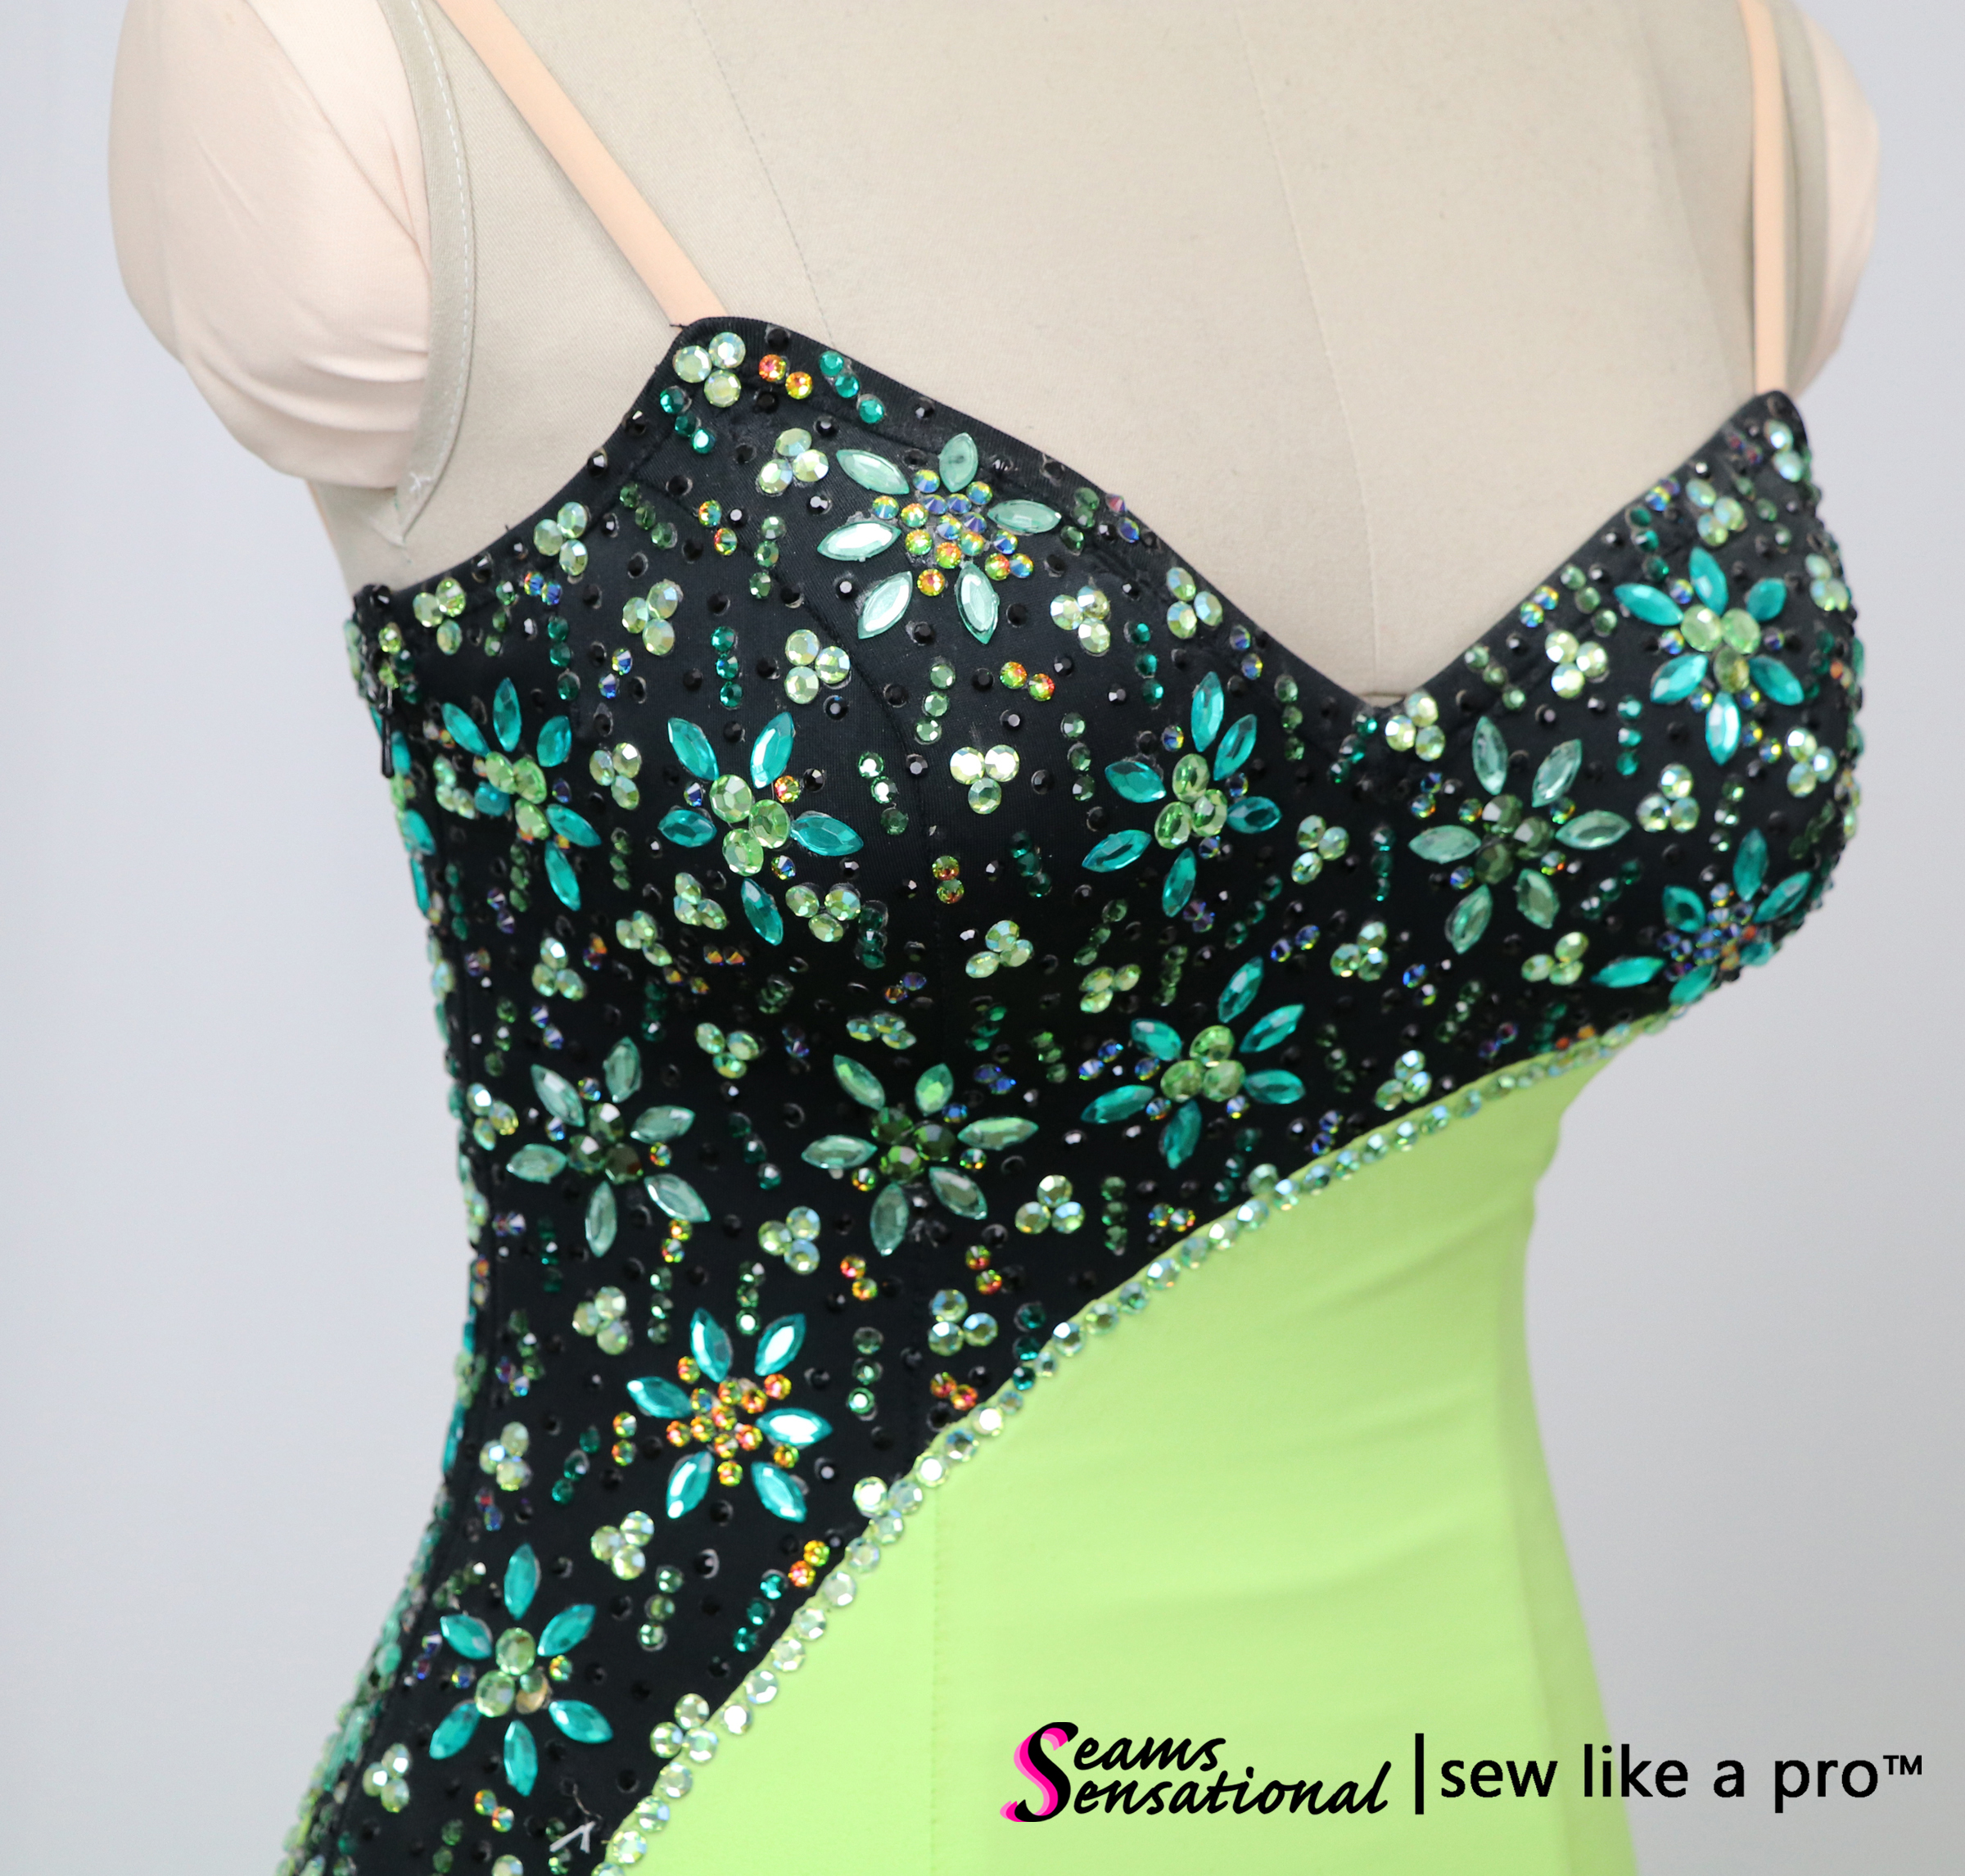 Key design element: feminine rhinestoning pattern on the competition Dancesport ballgown